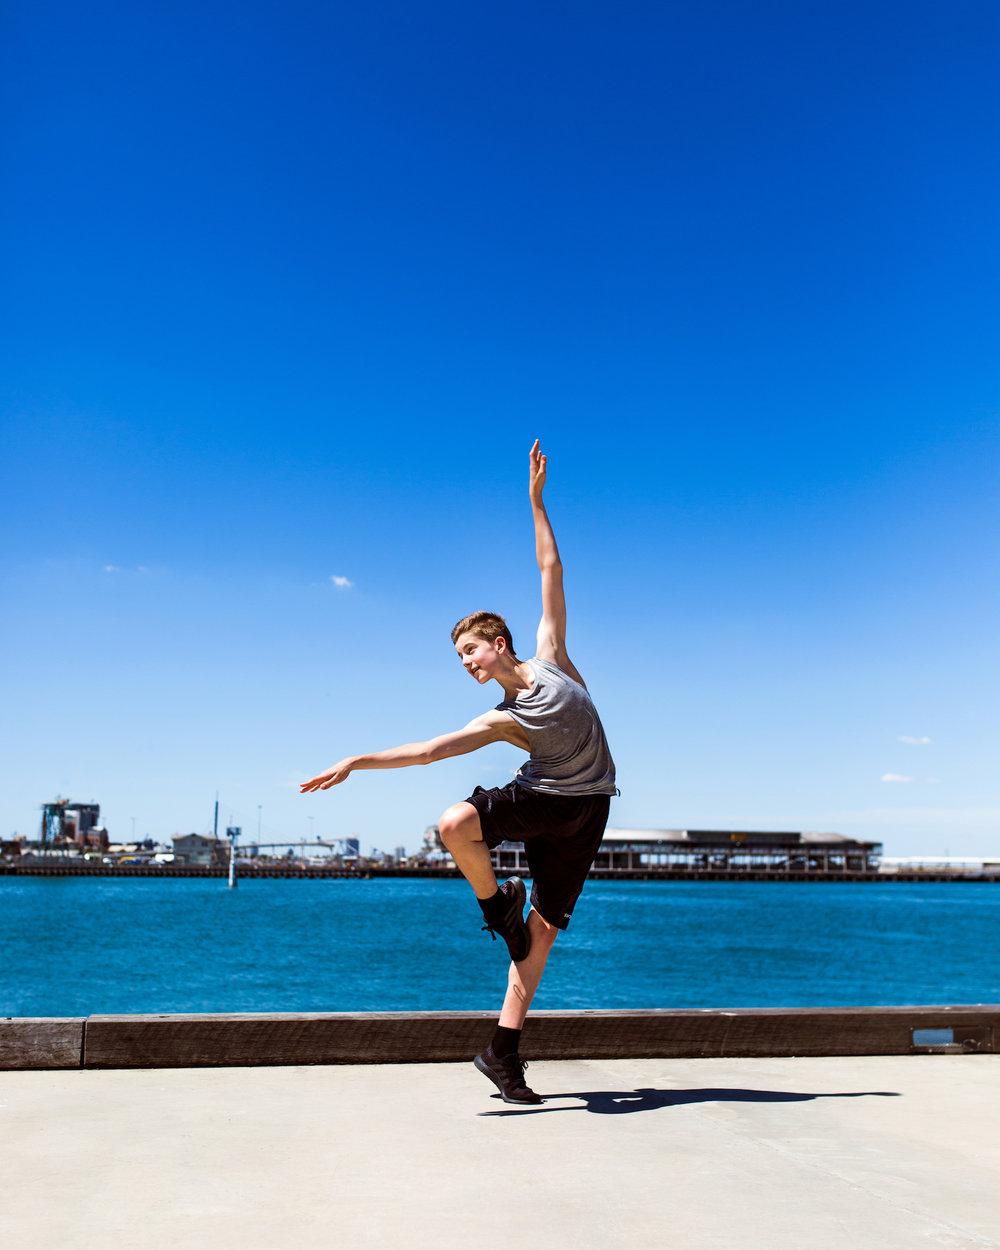 Tom wears Energetiks  Male Tank  and  Urban Shorts